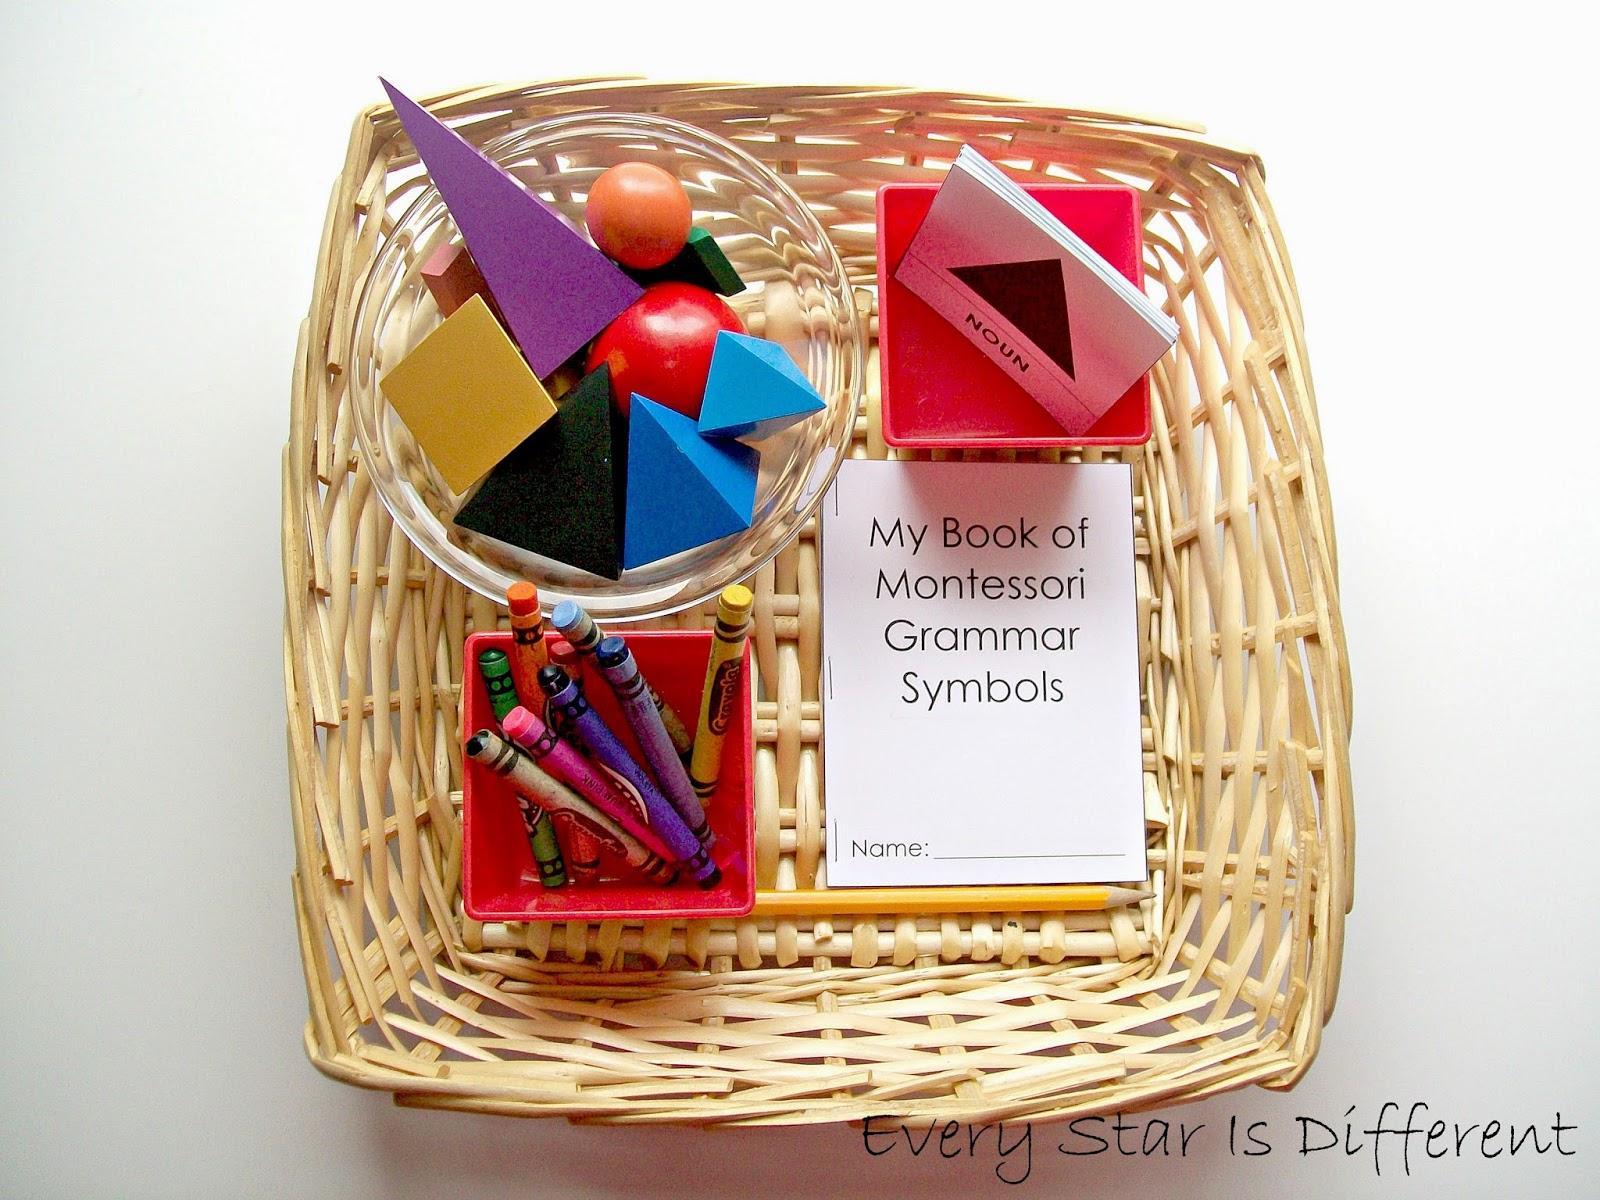 Montessori-inspired Grammar Activities - Every Star Is